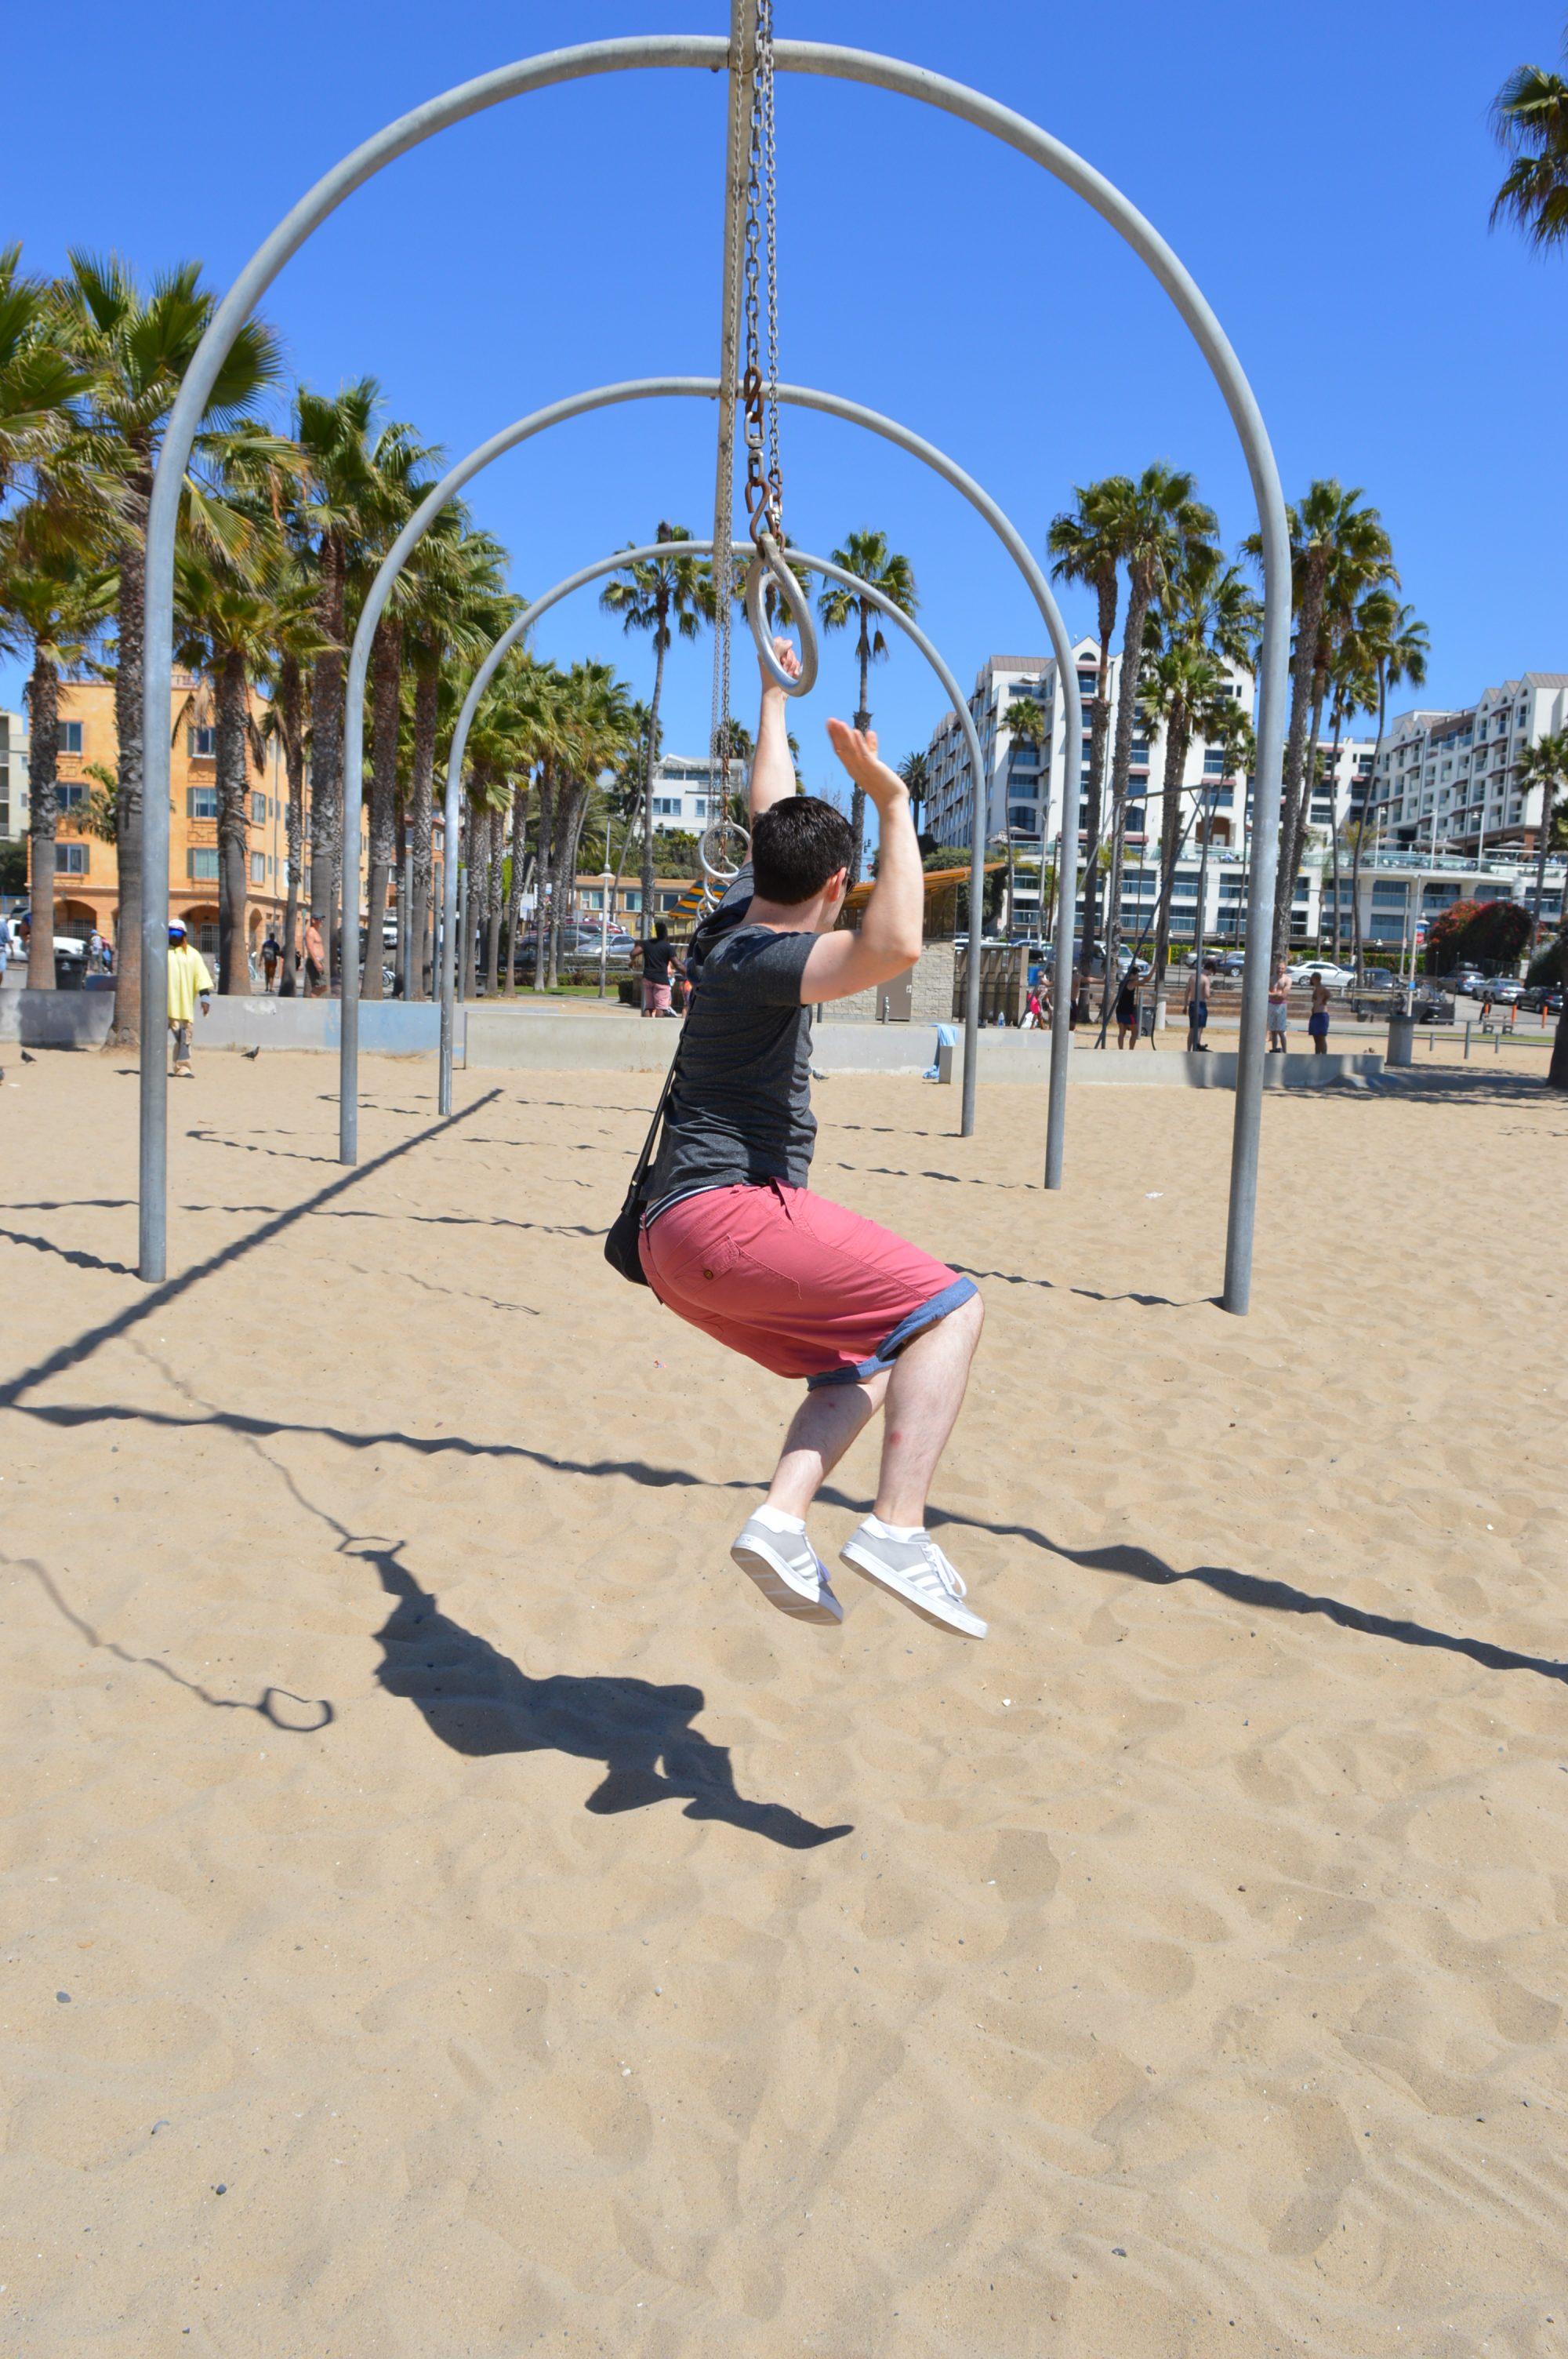 The Rings at Santa Monica Beach